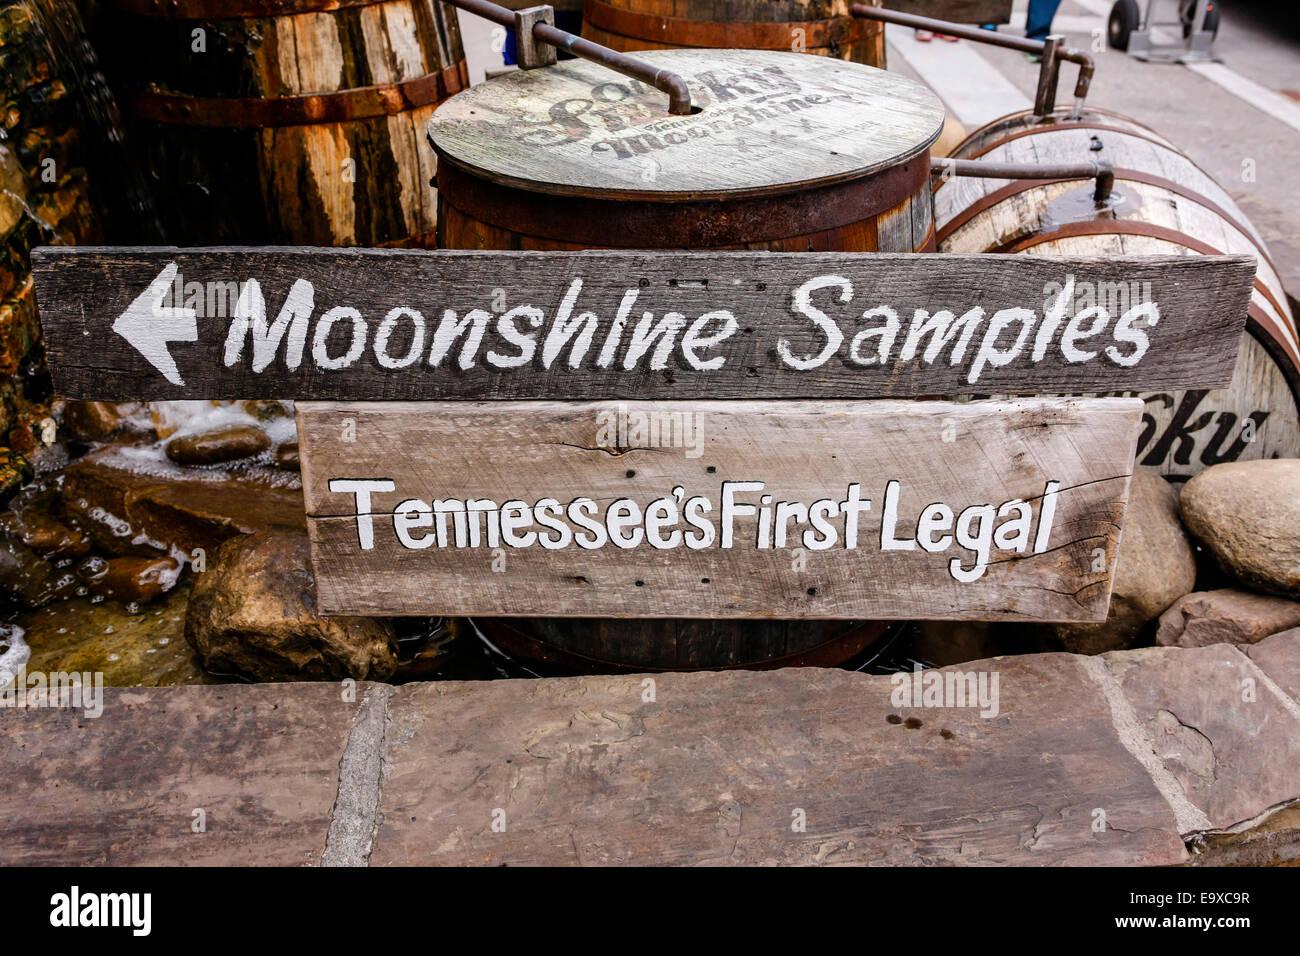 Moonshine Samples sign in Gatlinburg Tennessee - Stock Image